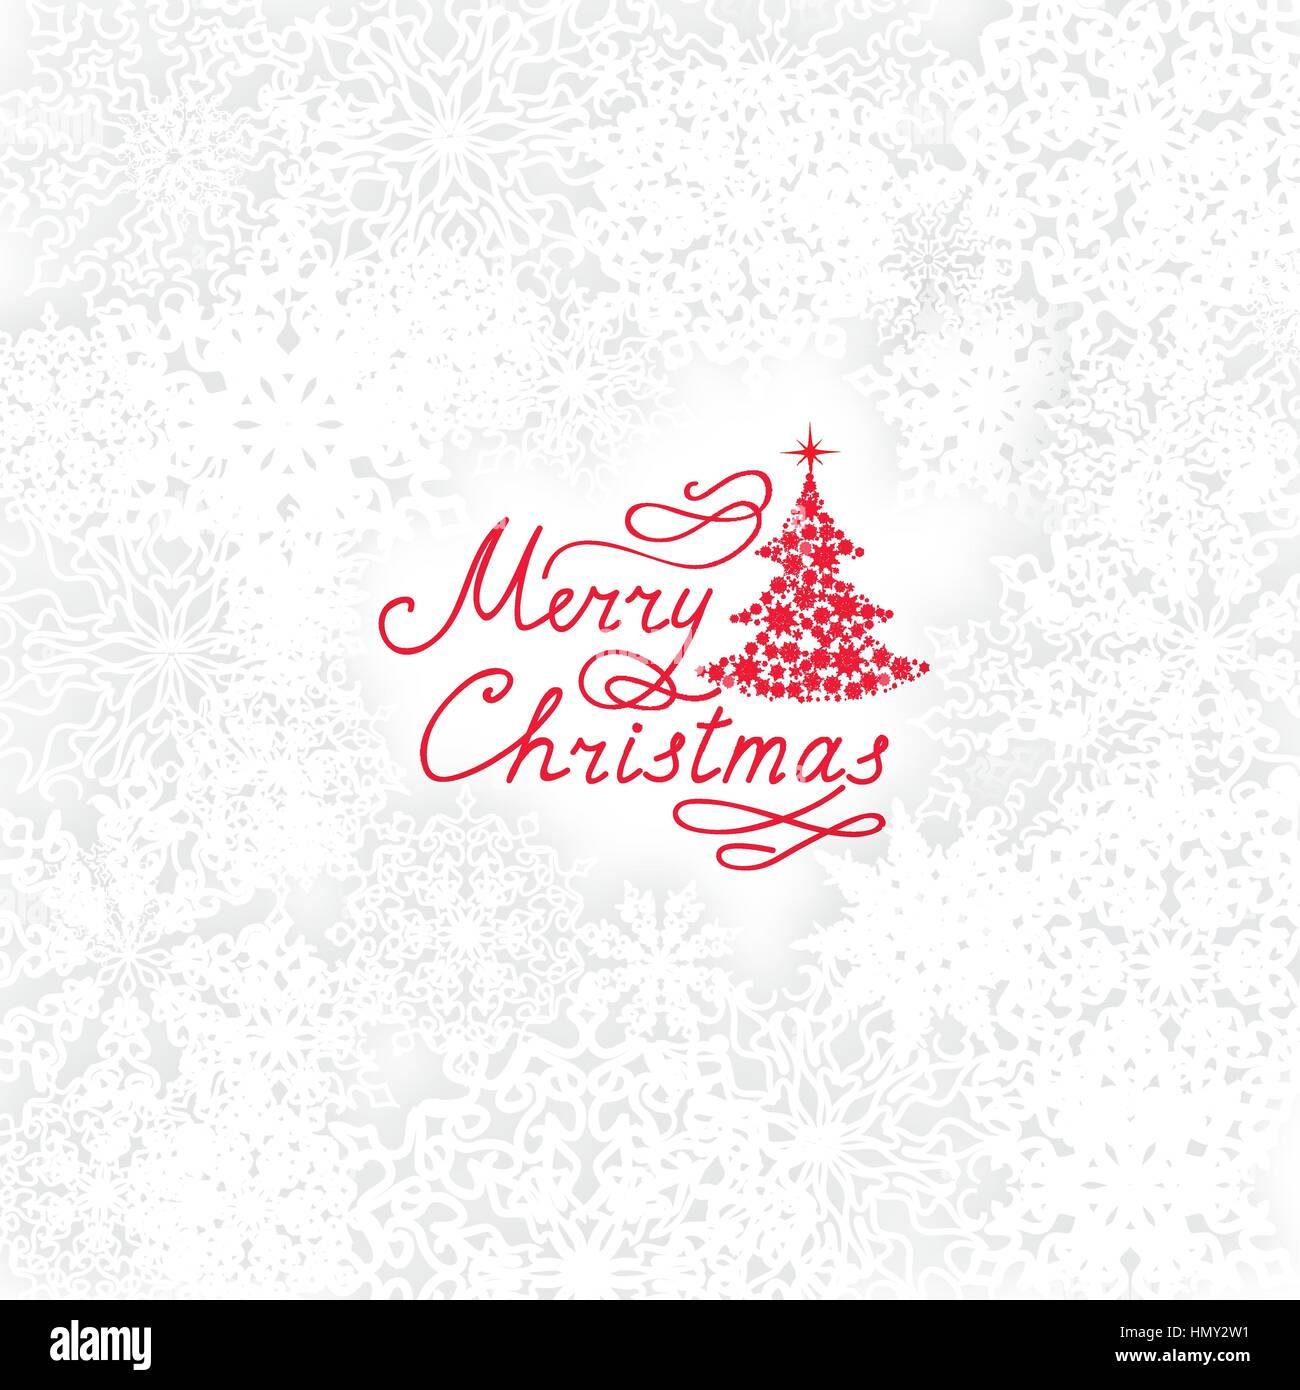 Merry Christmas Black White Handwritten Stockfotos & Merry Christmas ...